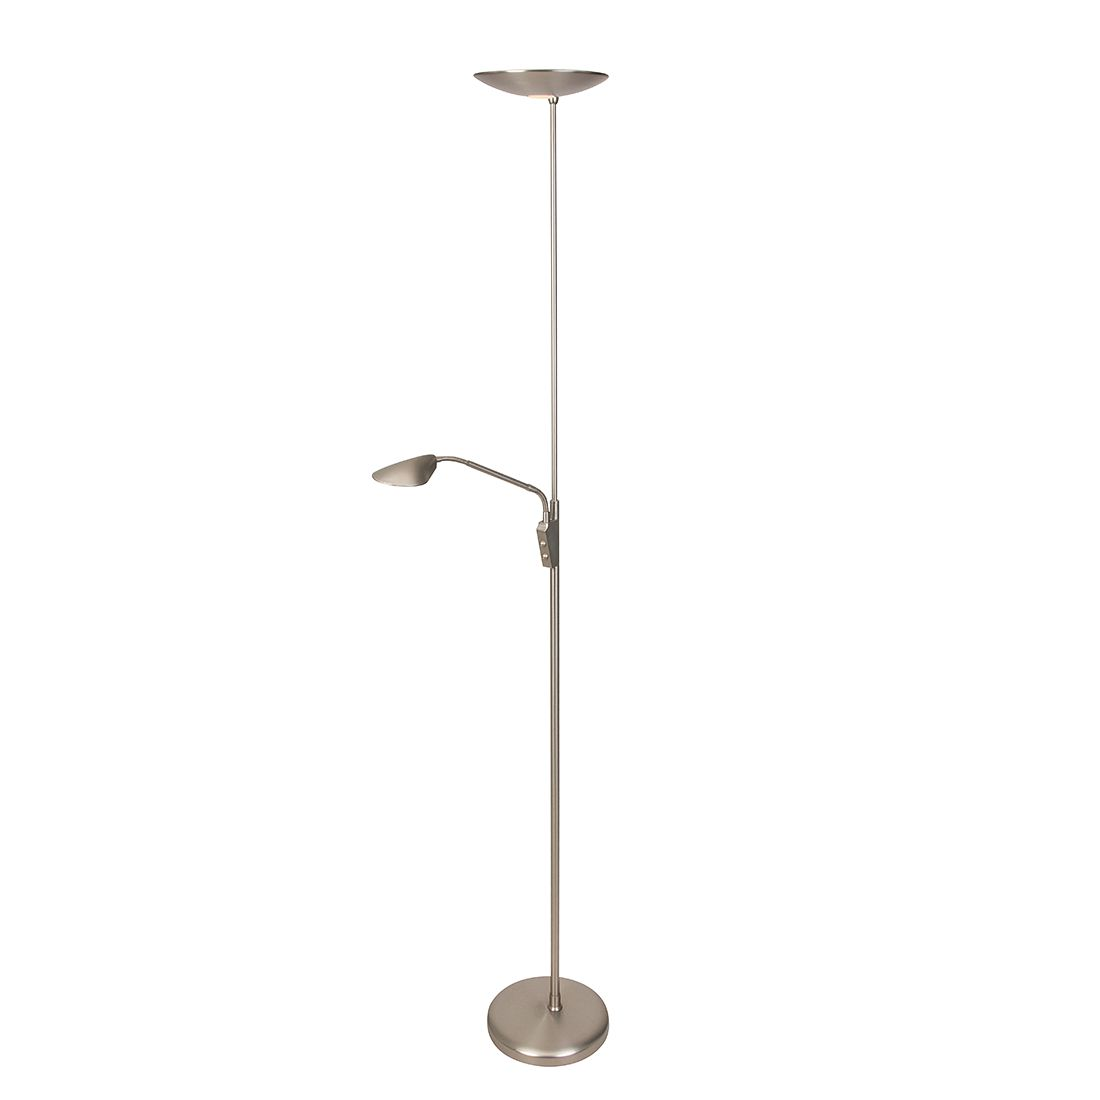 Home24 lampen staande lampen steinhauer for Lampen 2 flammig